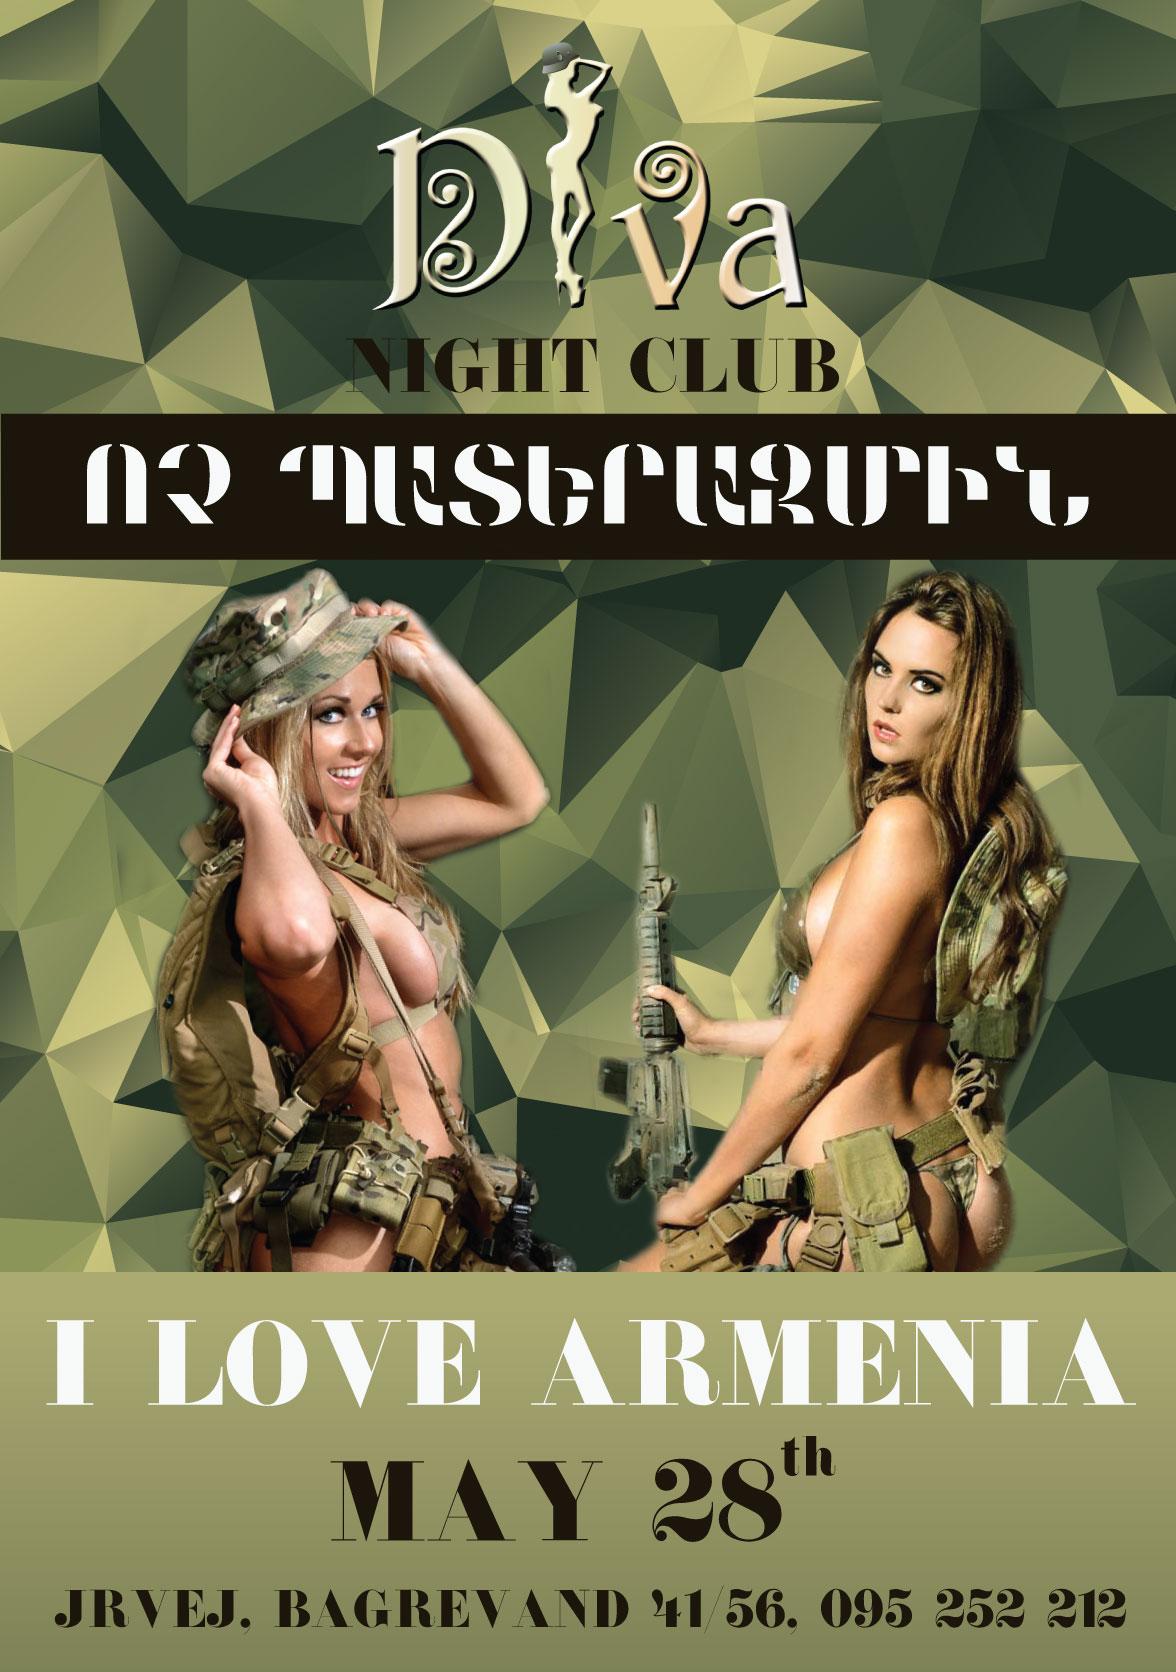 I Love Armenia